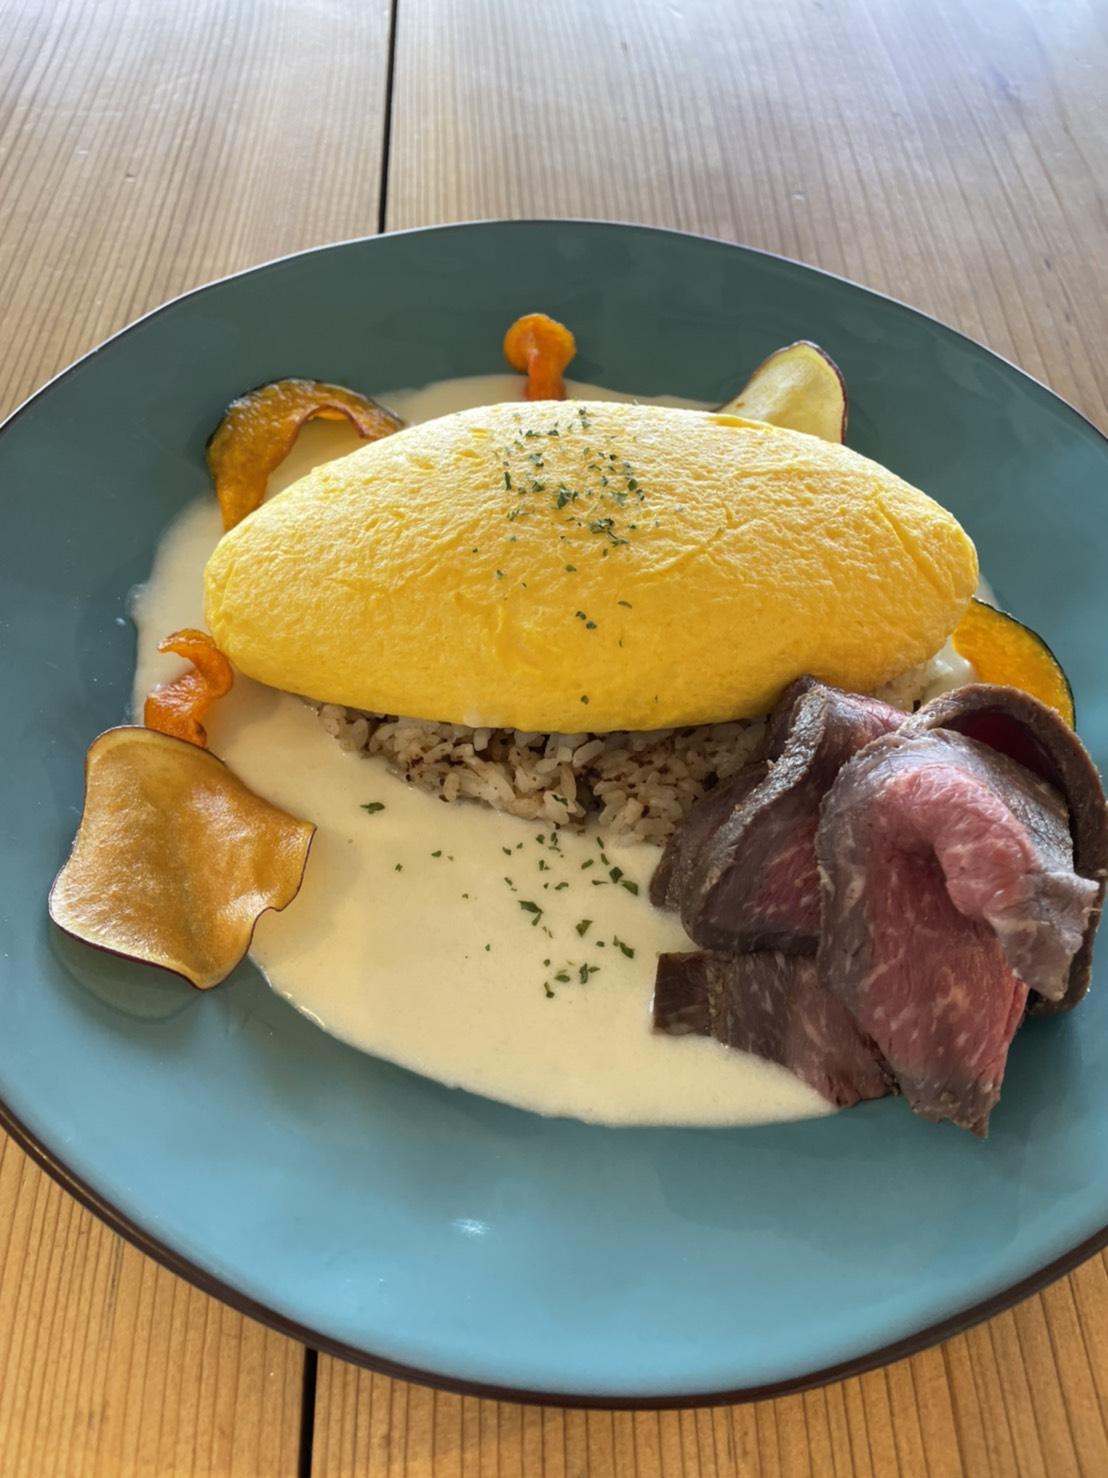 FAN's kitchen|越前海岸のカフェ・レストラン|メニュー表2